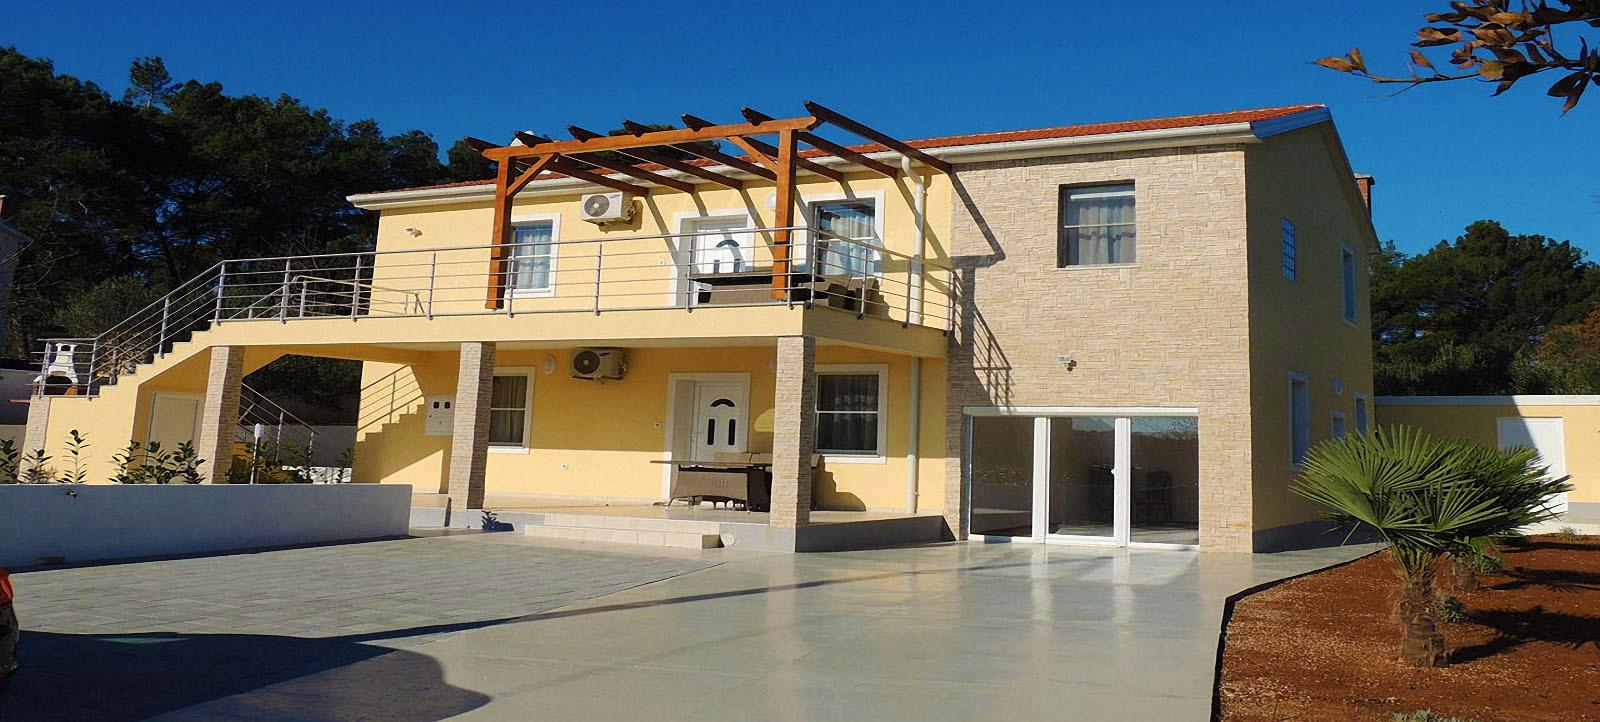 Ferienhaus 35940  H(13) - Krk (1532314), Krk, Insel Krk, Kvarner, Kroatien, Bild 3